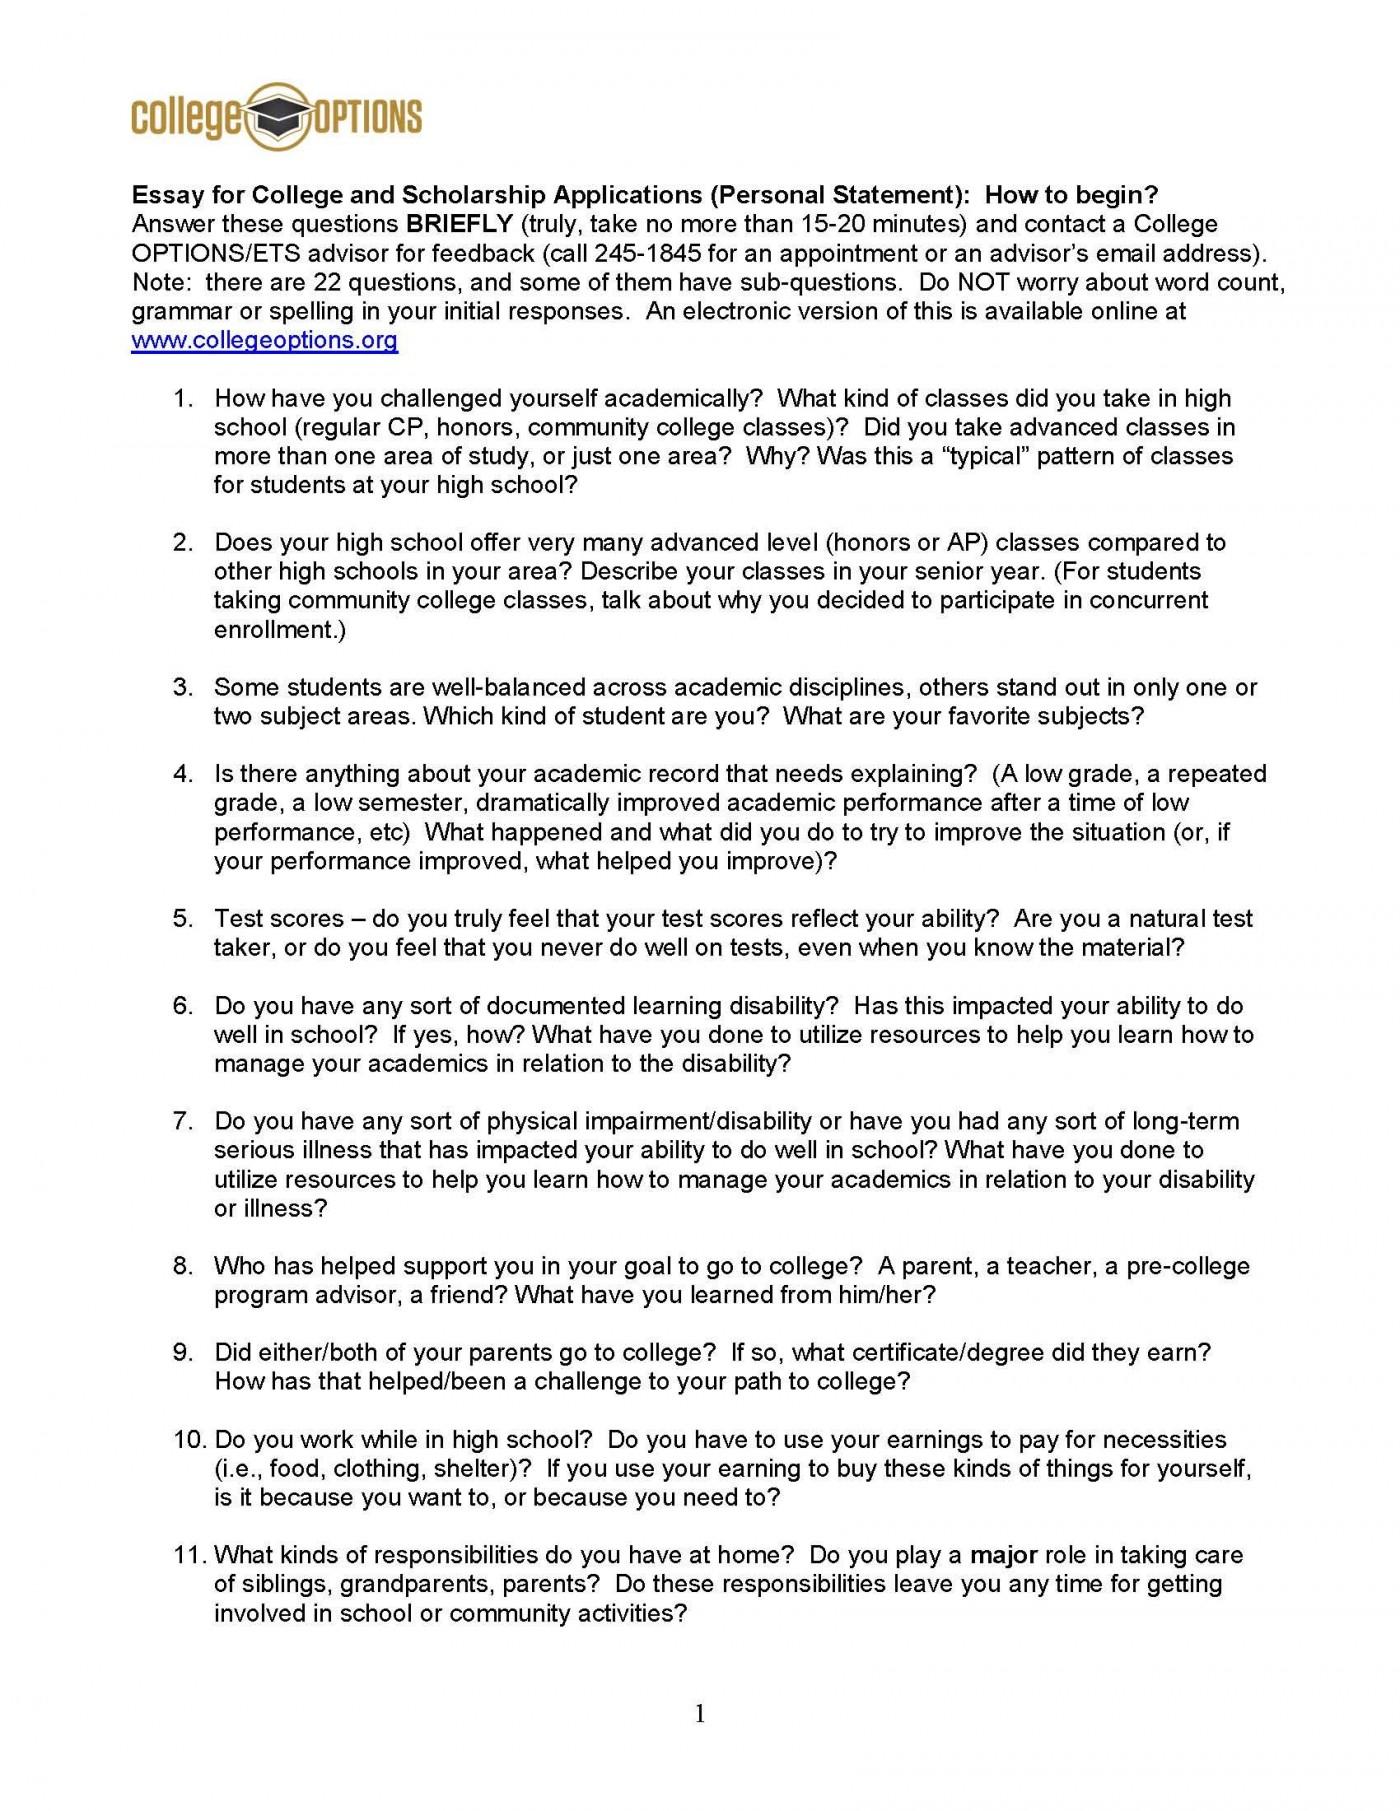 Essays urging ratification during